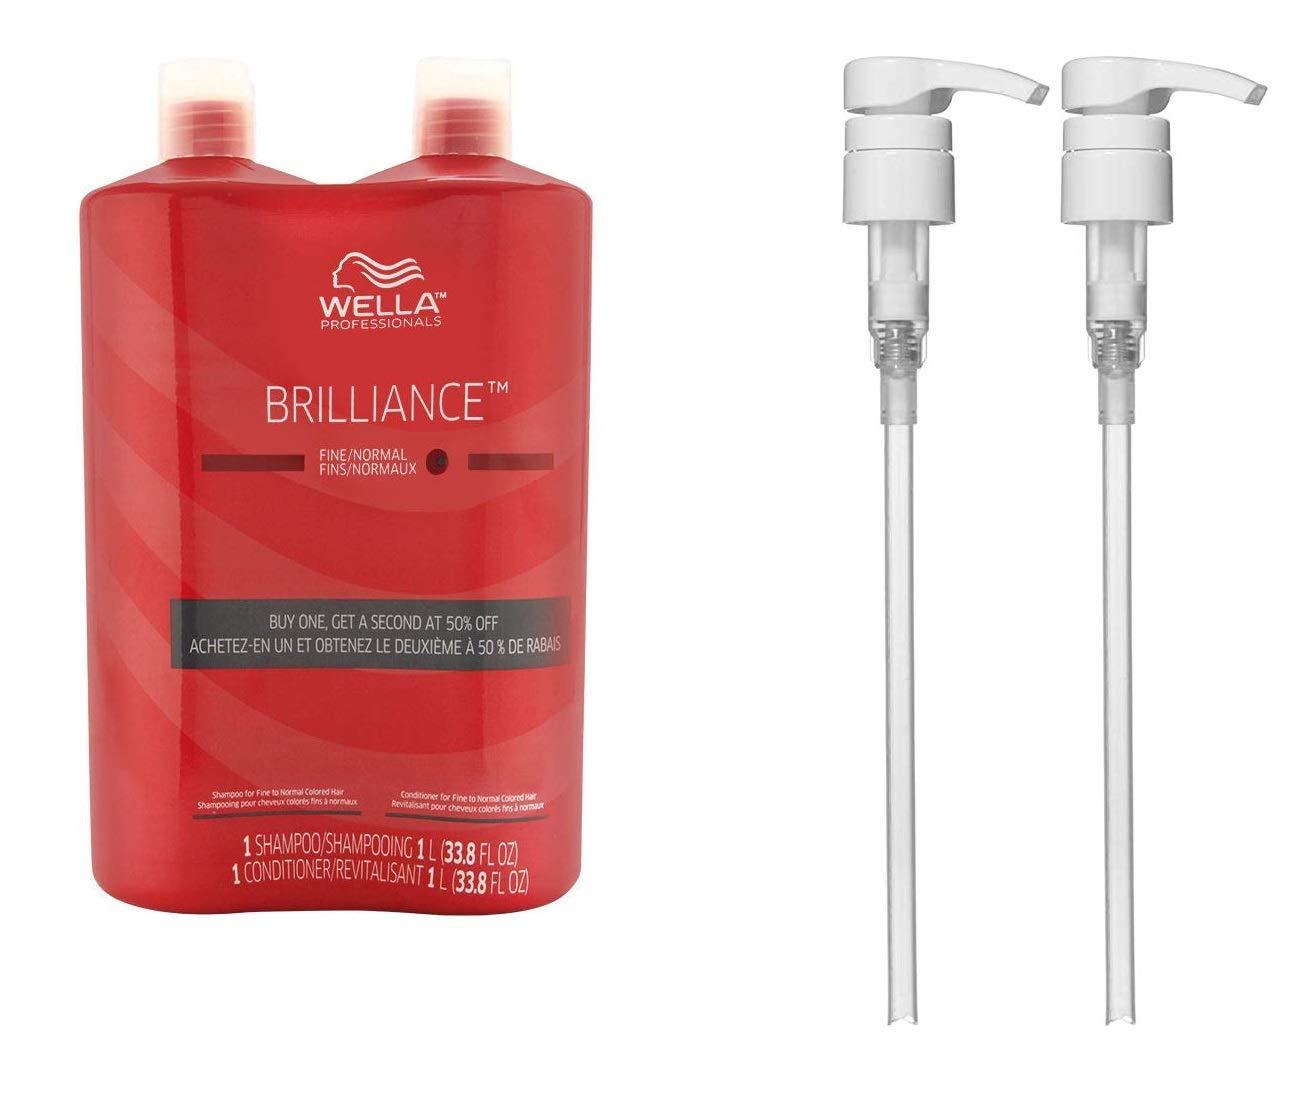 Bundle -4 Items : WELLA Brilliance Shampoo & Conditioner Fine to Normal Coloured Hair, Liter Duo 33.8 Oz + Wella liter pumps (2) by Wella